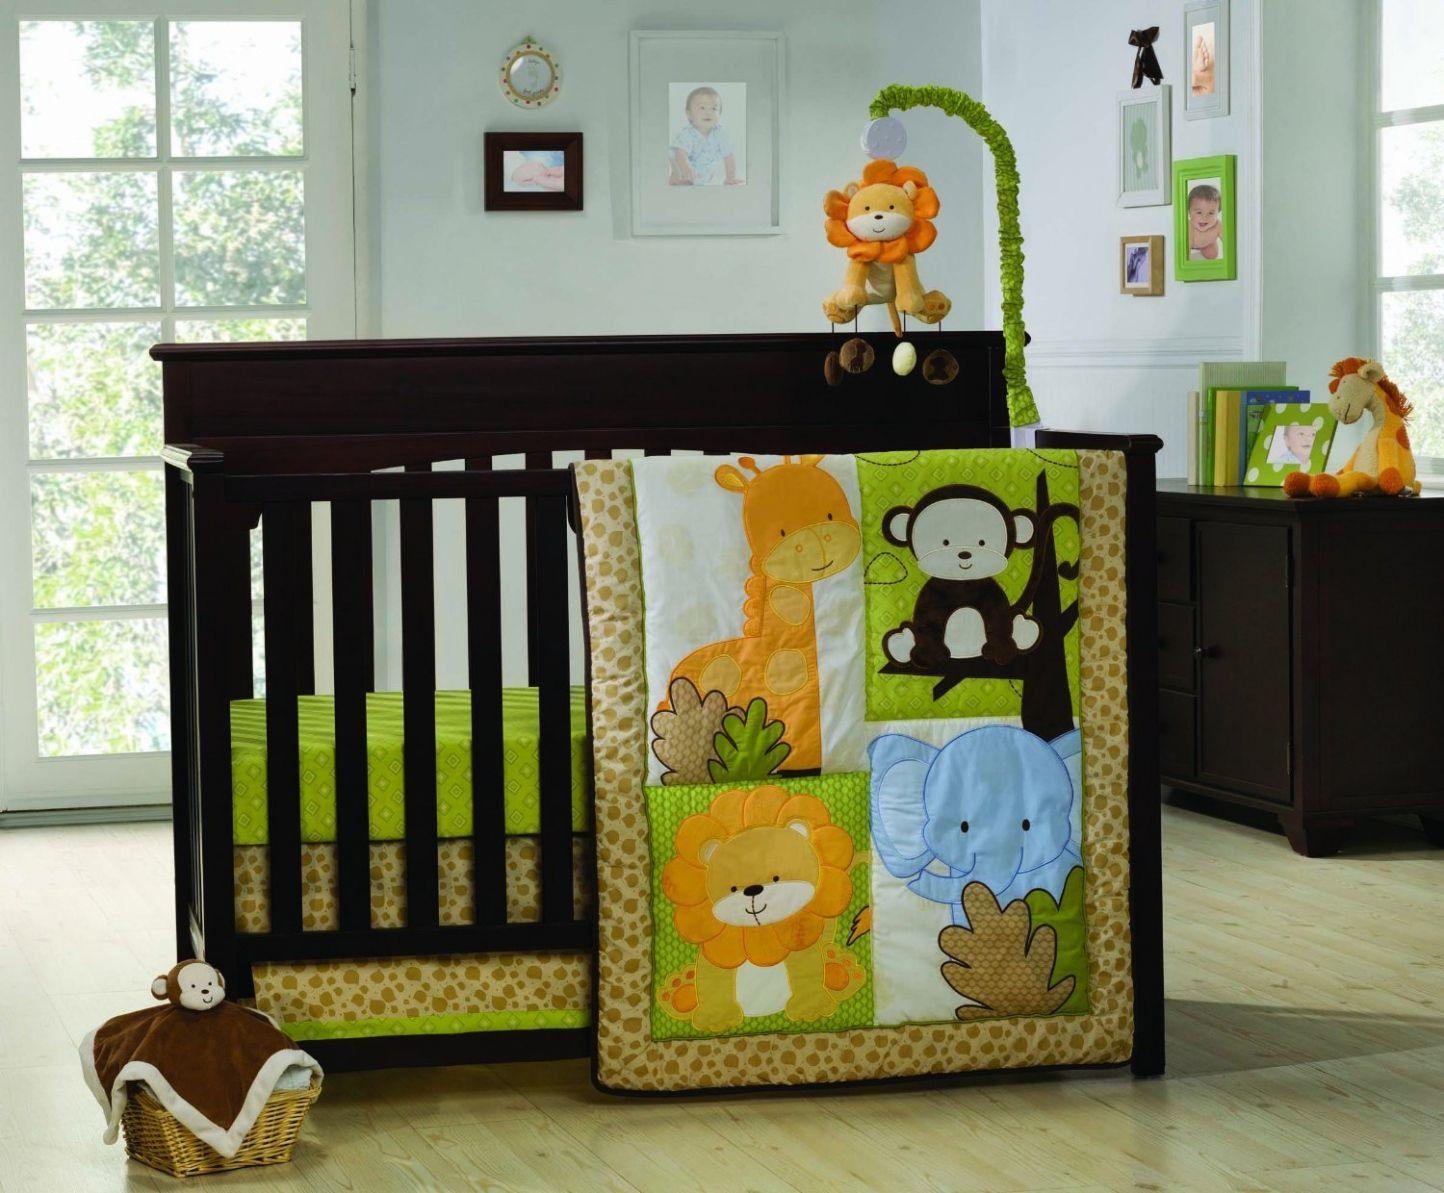 Kids Room:Baby Nursery Room Decoration Colorful Baby Blanket With Animal  Theme Dark Baby Crib Design With Vinyl Flooring Modern Baby Nursery Design  With ...